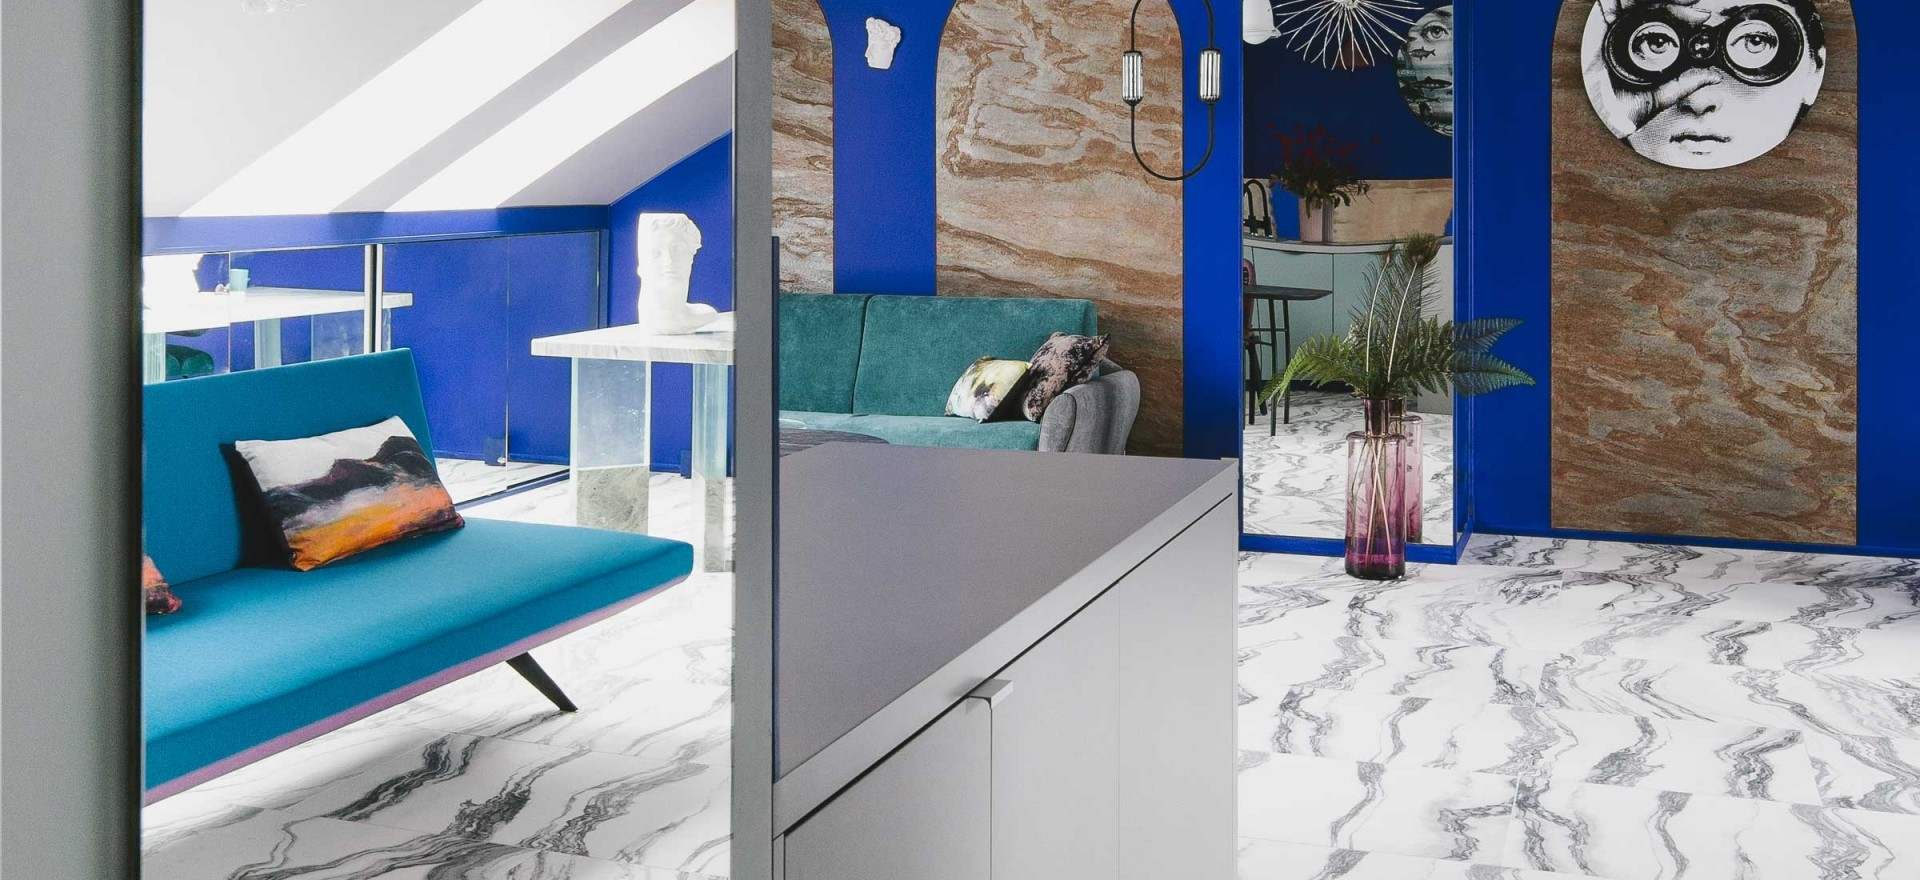 IMA-Interiors-Deep-Blue-4 copy 1